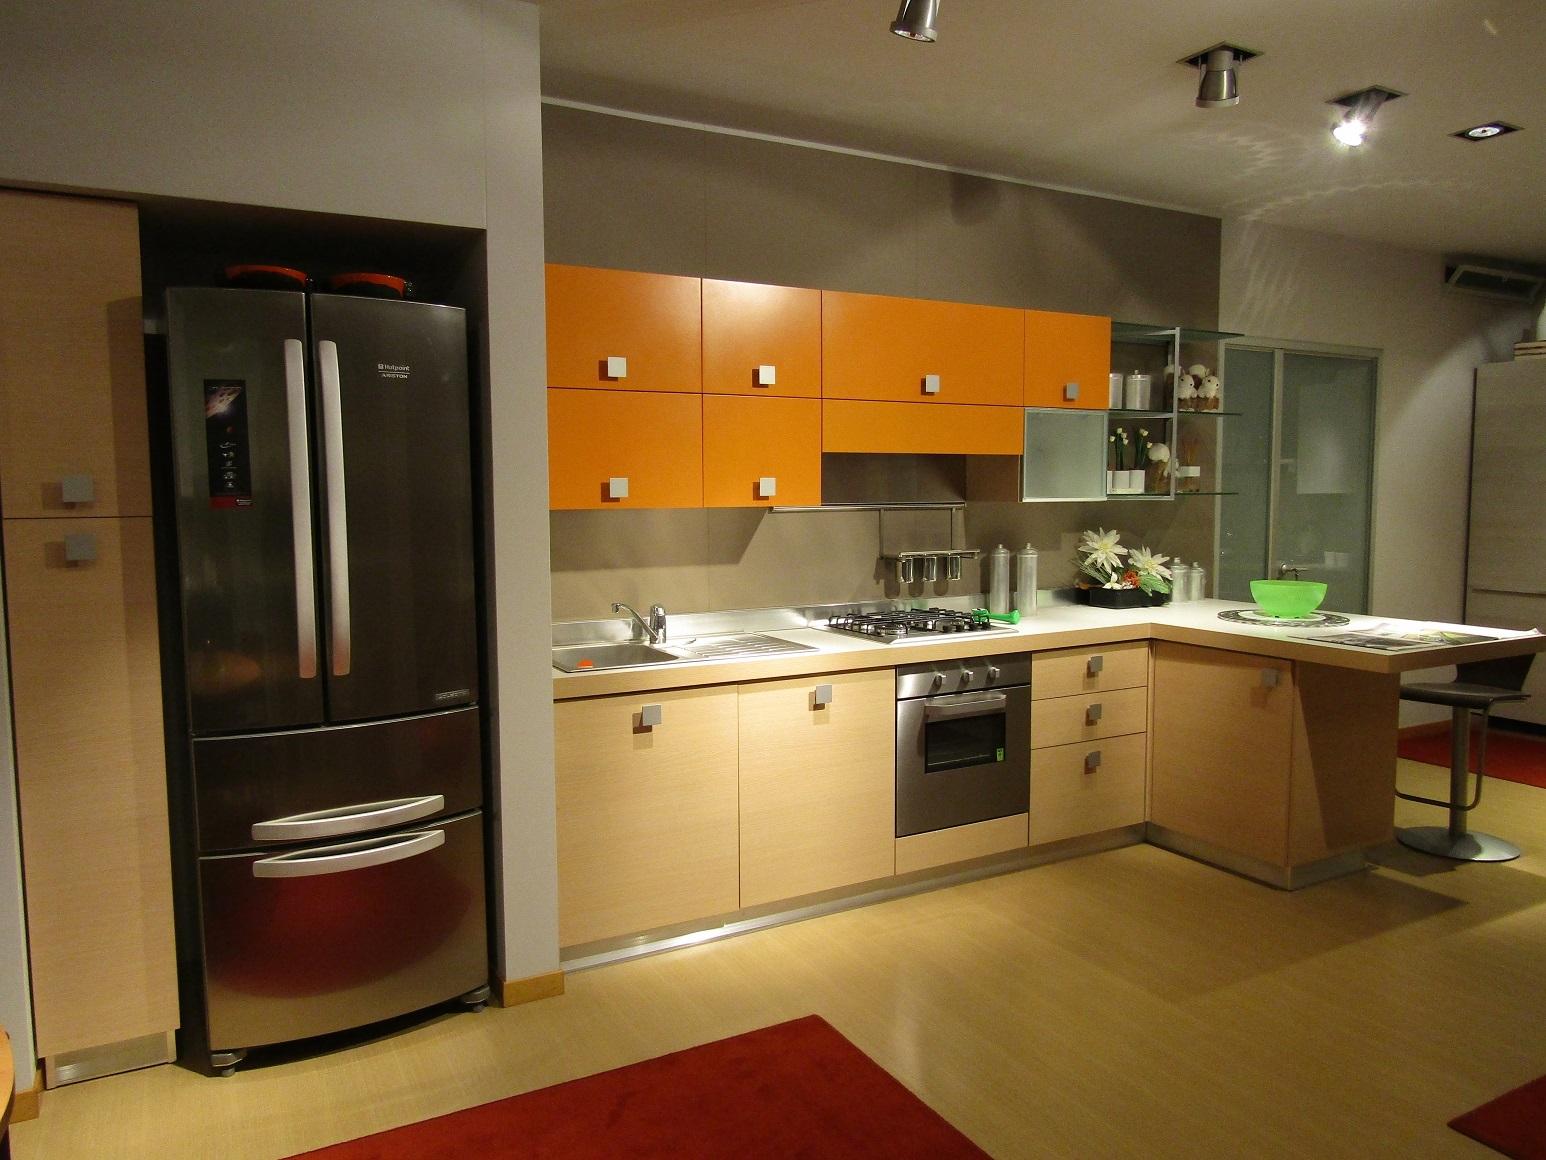 Cucina costo cool best costo cucina veneta cucine ideas - Costo cucina veneta cucine ...